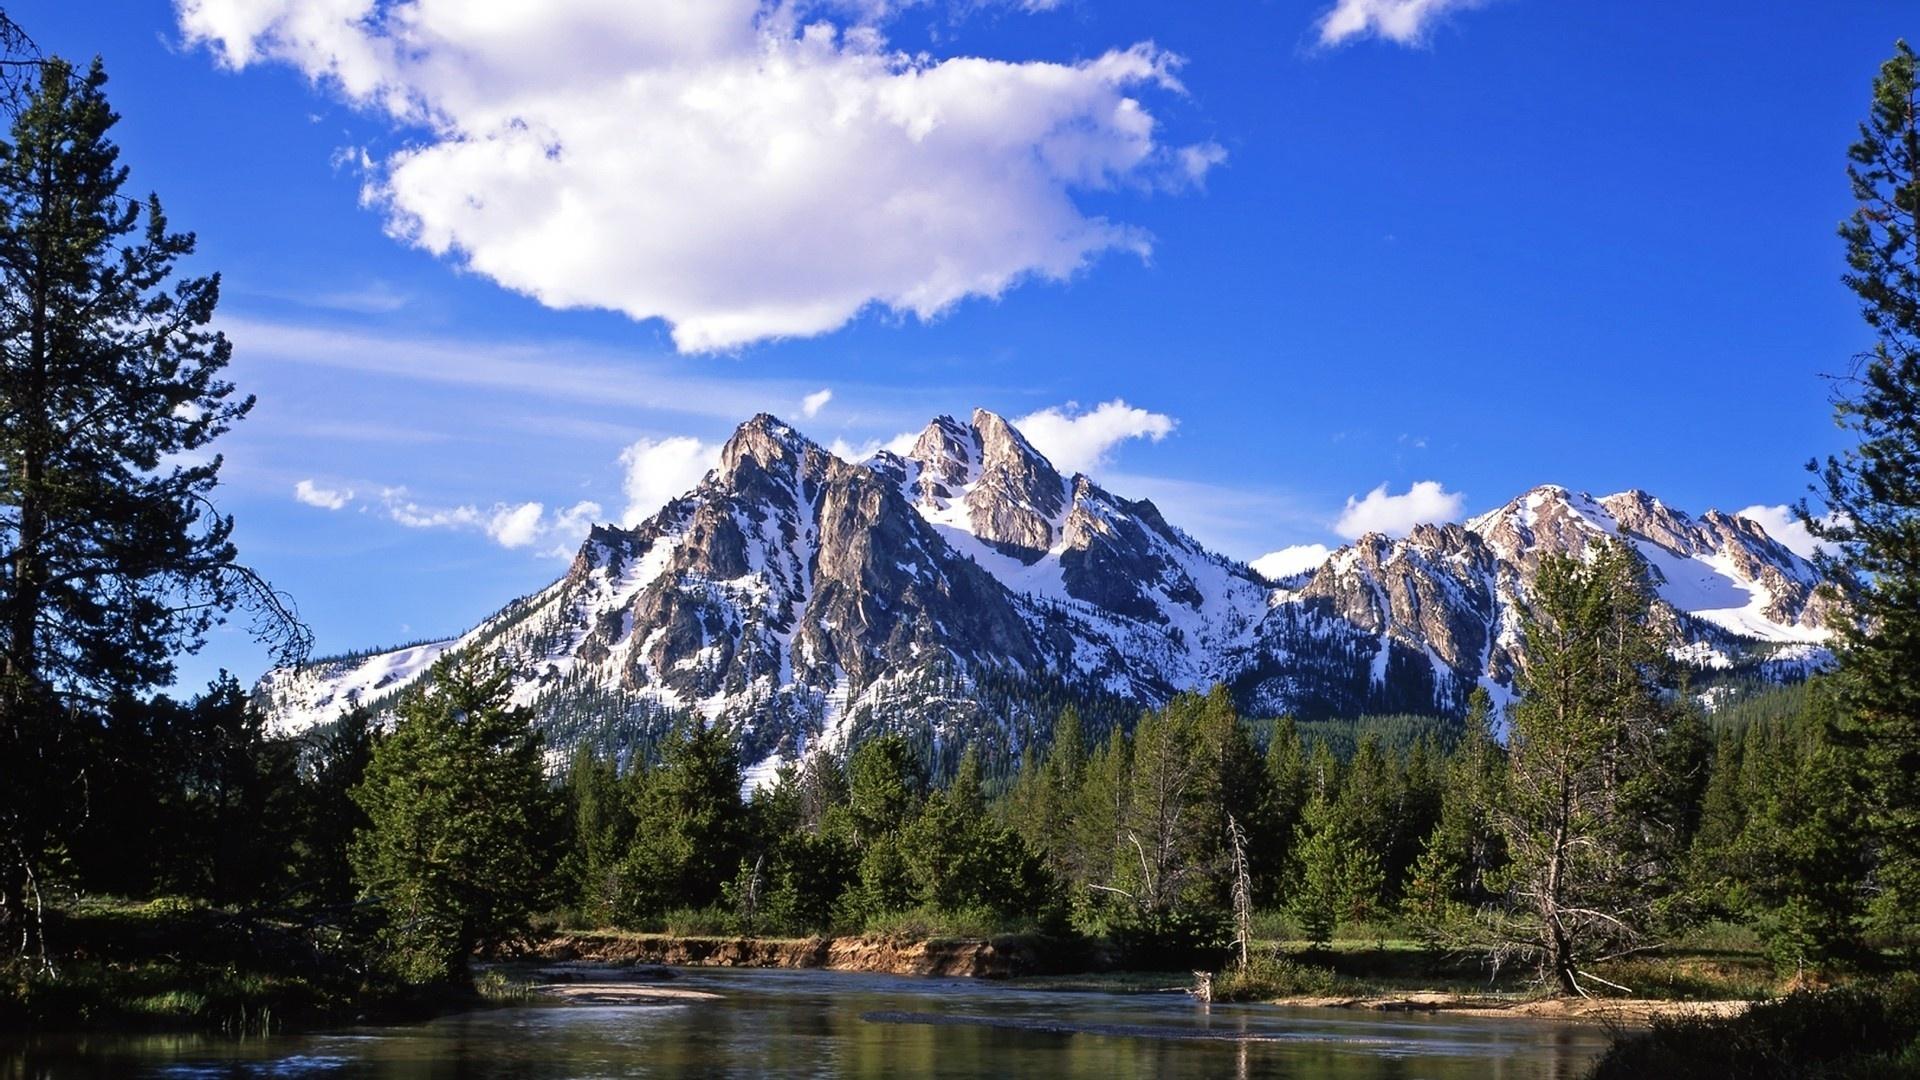 Mountain HD Wallpaper   Background Image   1920x1080   ID ...